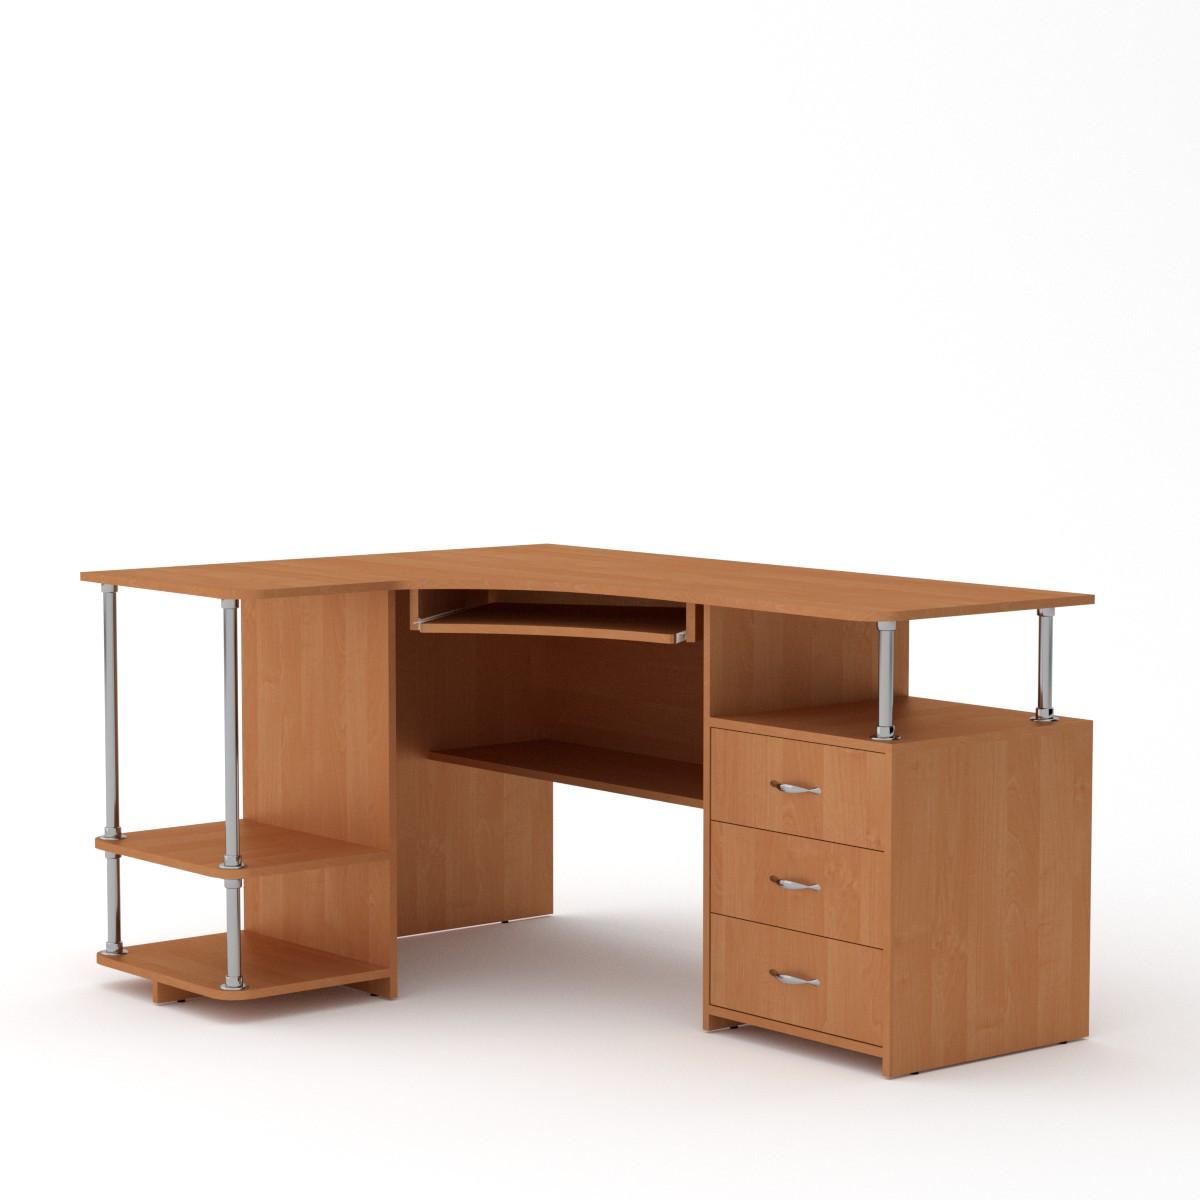 Стол компьютерный СУ-4 (кромка АБС - 2мм) ольха Компанит (150х110х77 см)